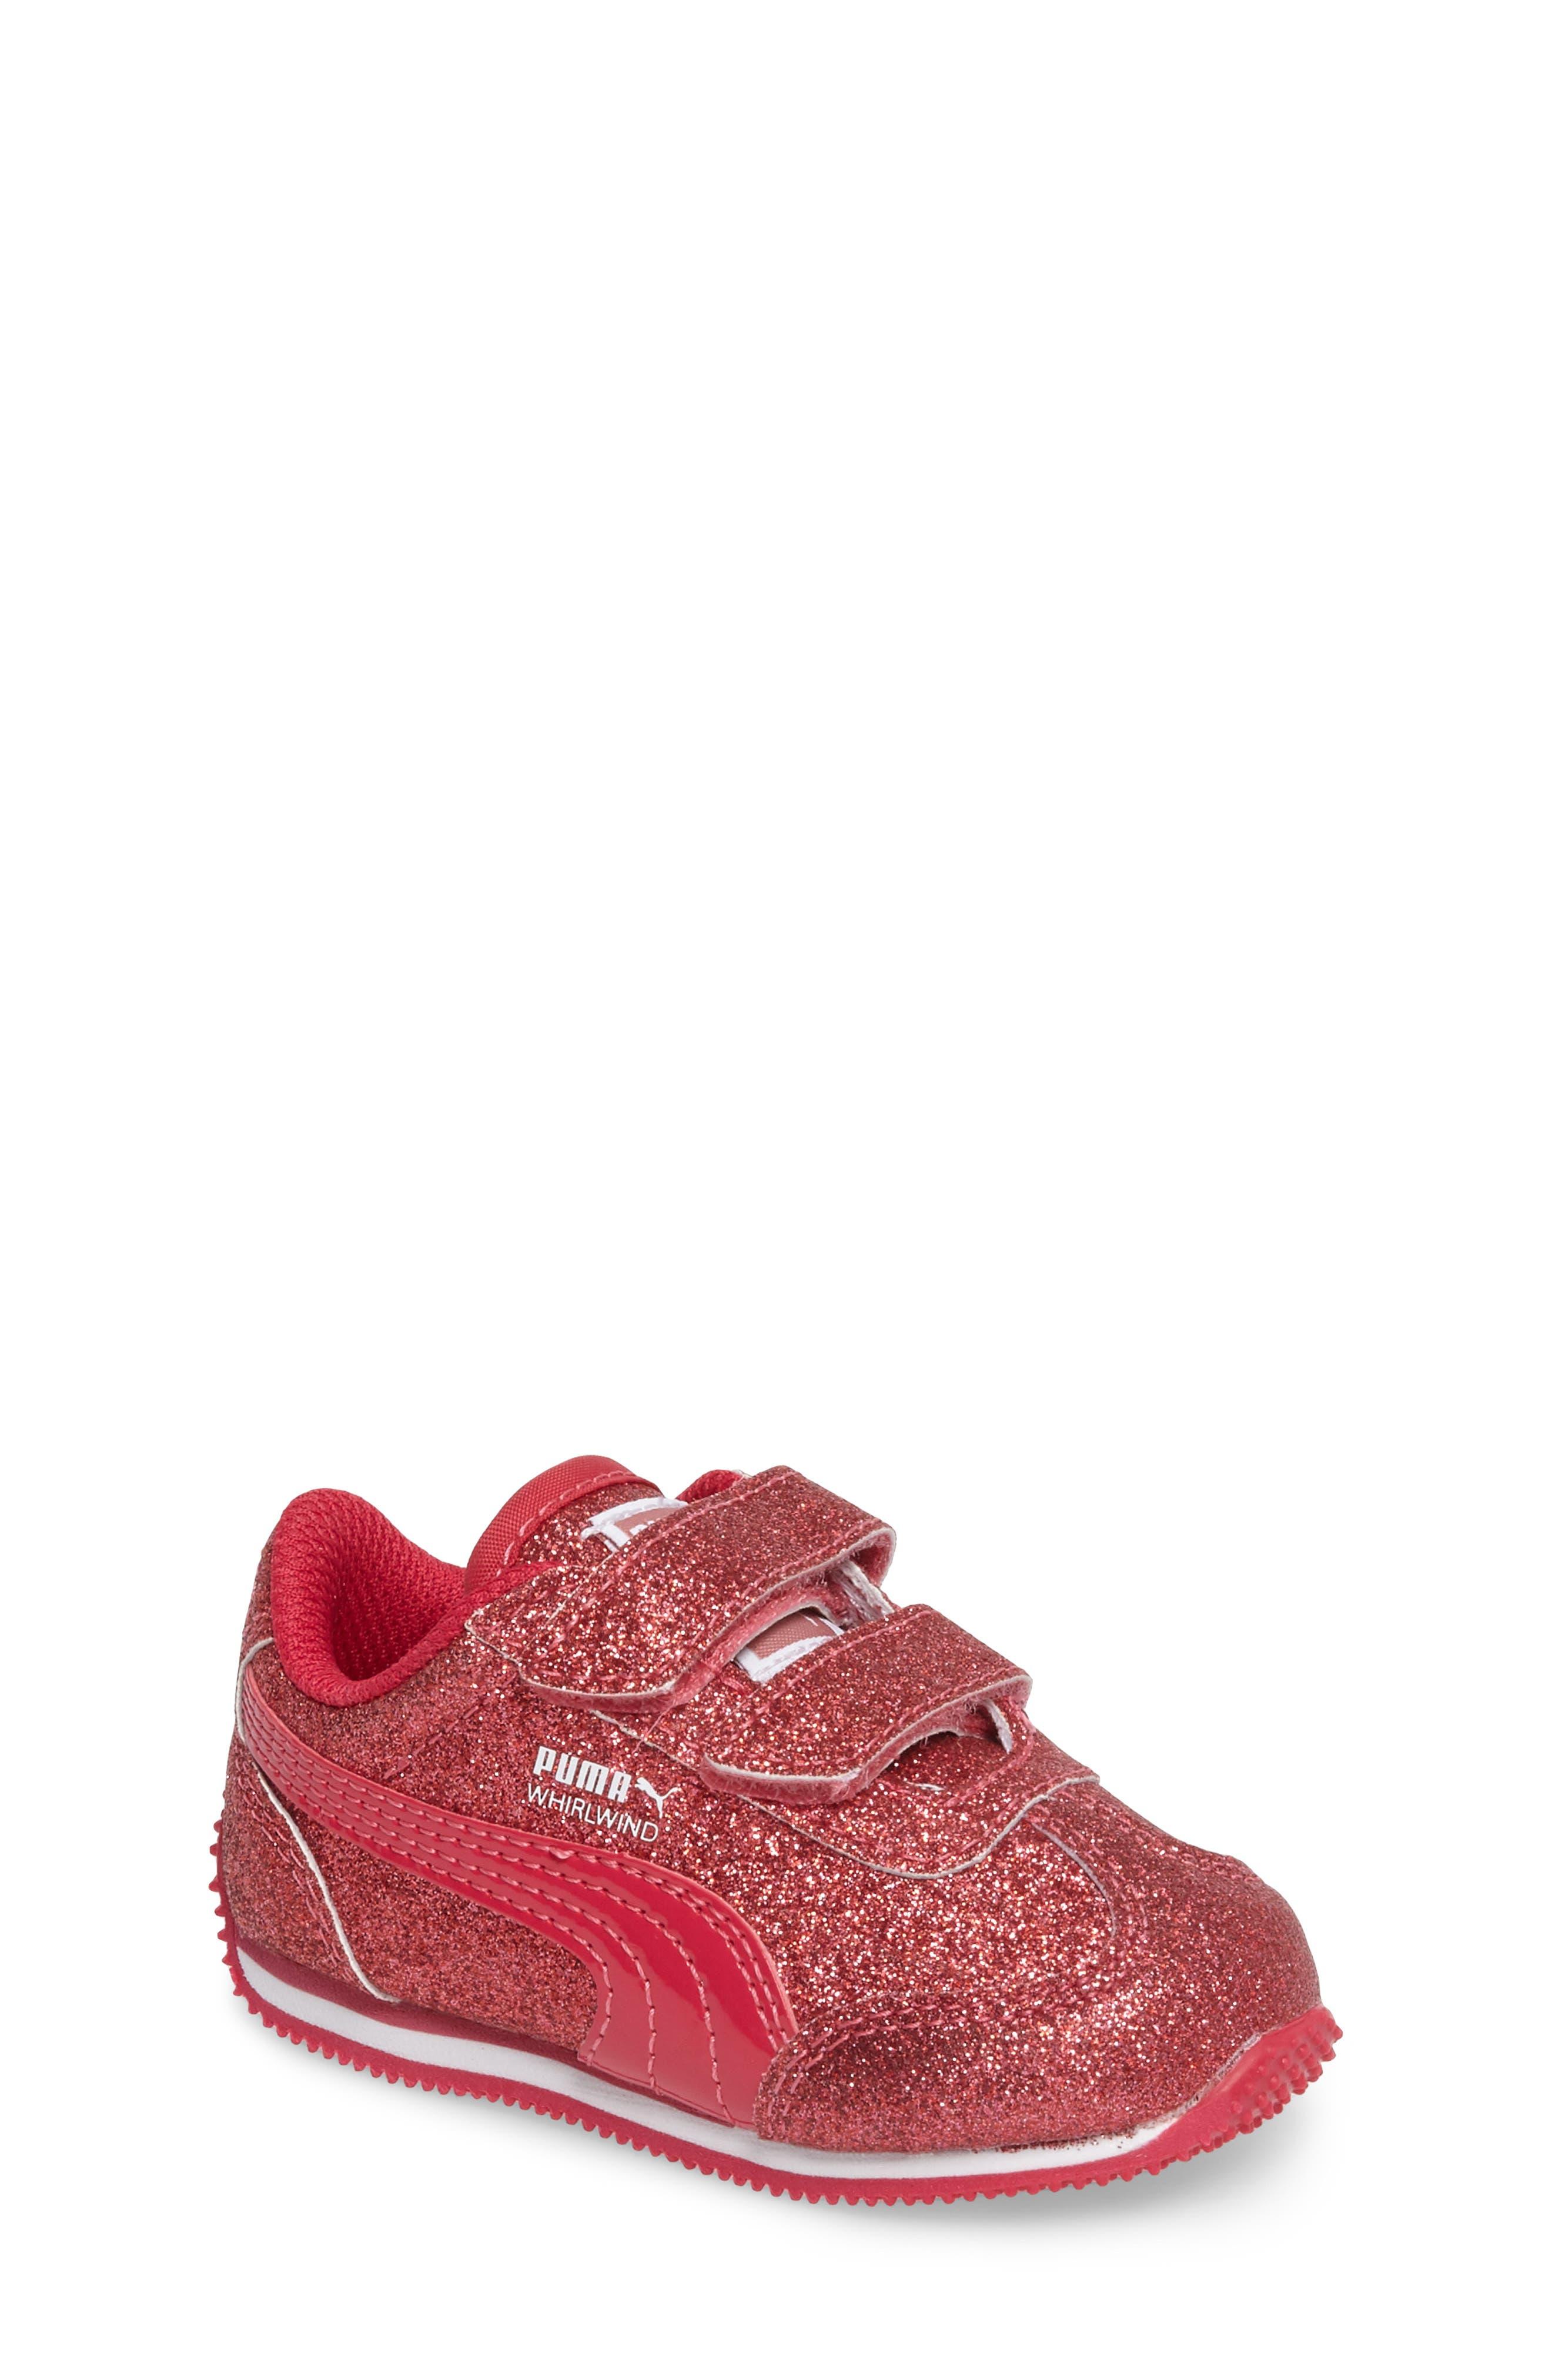 Puma Whirlwind Glitz Sneaker (Baby, Walker, Toddler, Little Kid & Big Kid)